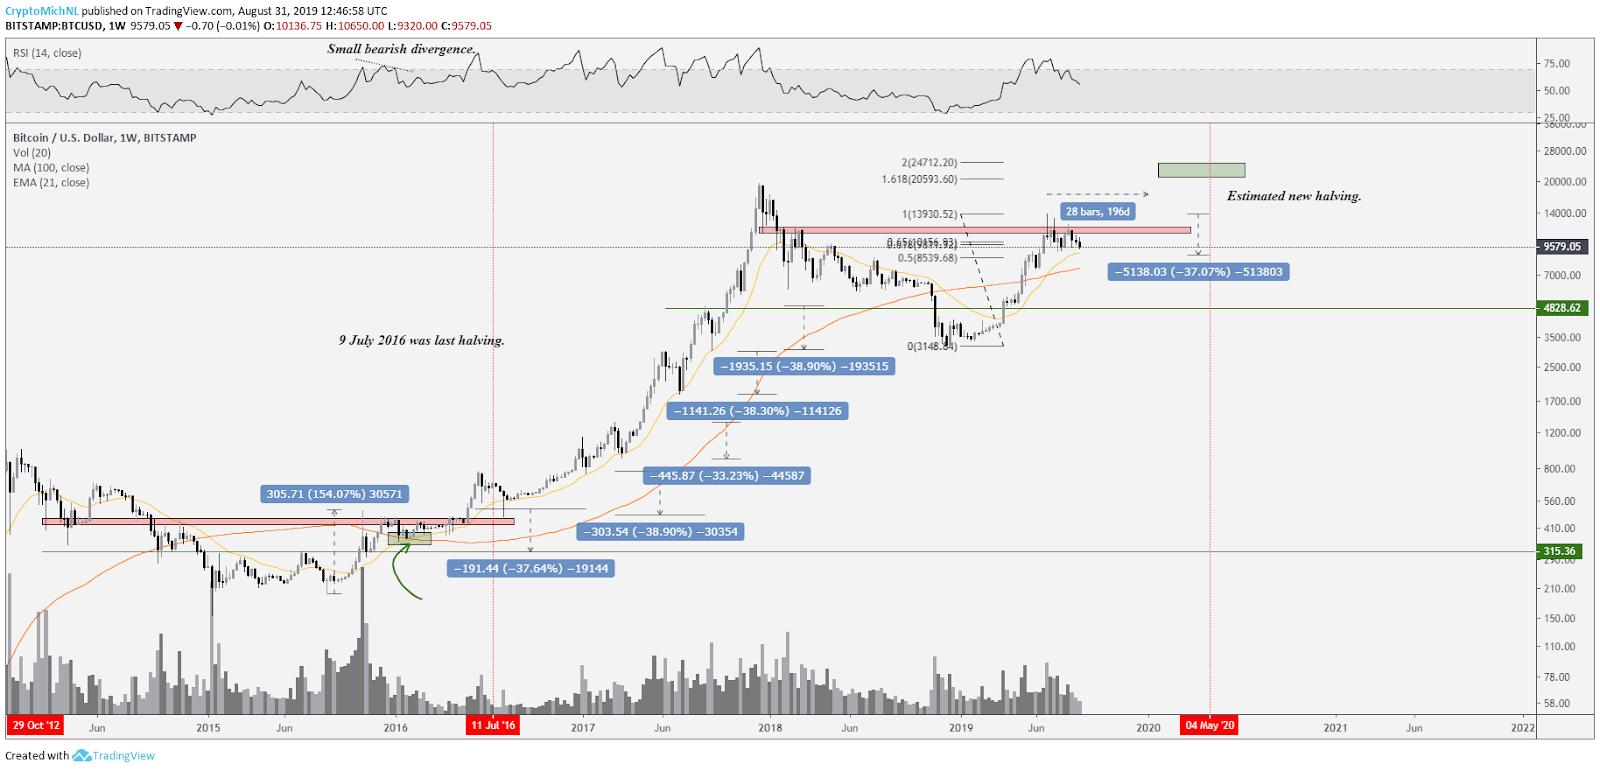 Bitcoin Price: 4 Key Similarities to Previous Bull Market